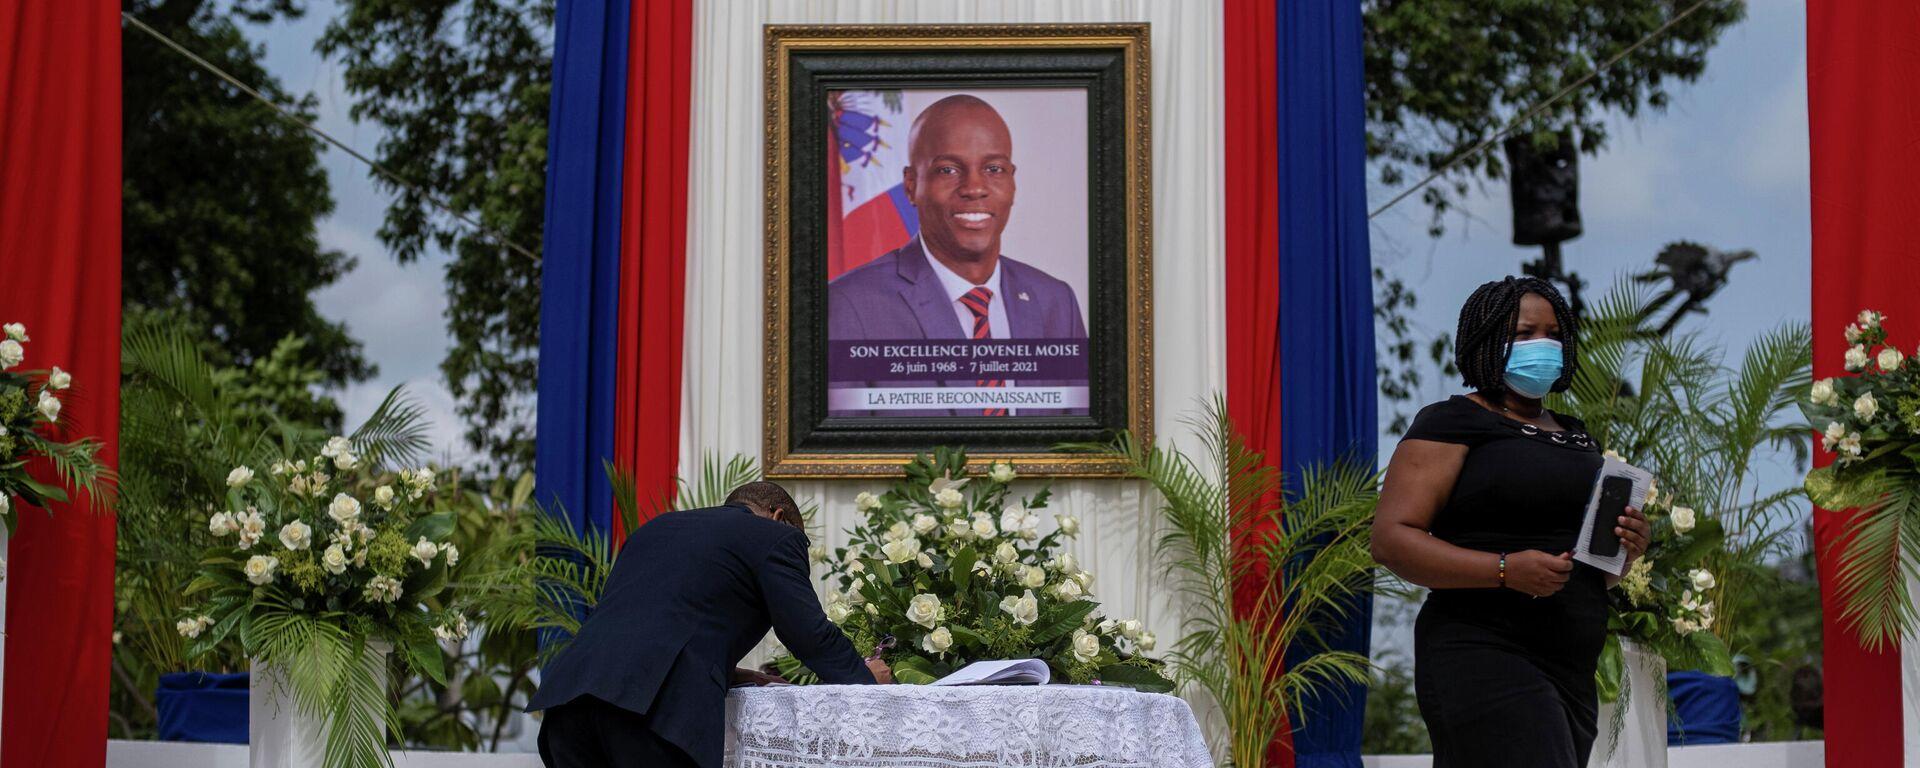 Ceremonioa en honor al expresidente de Haití, Jovenel Moise - Sputnik Mundo, 1920, 10.08.2021